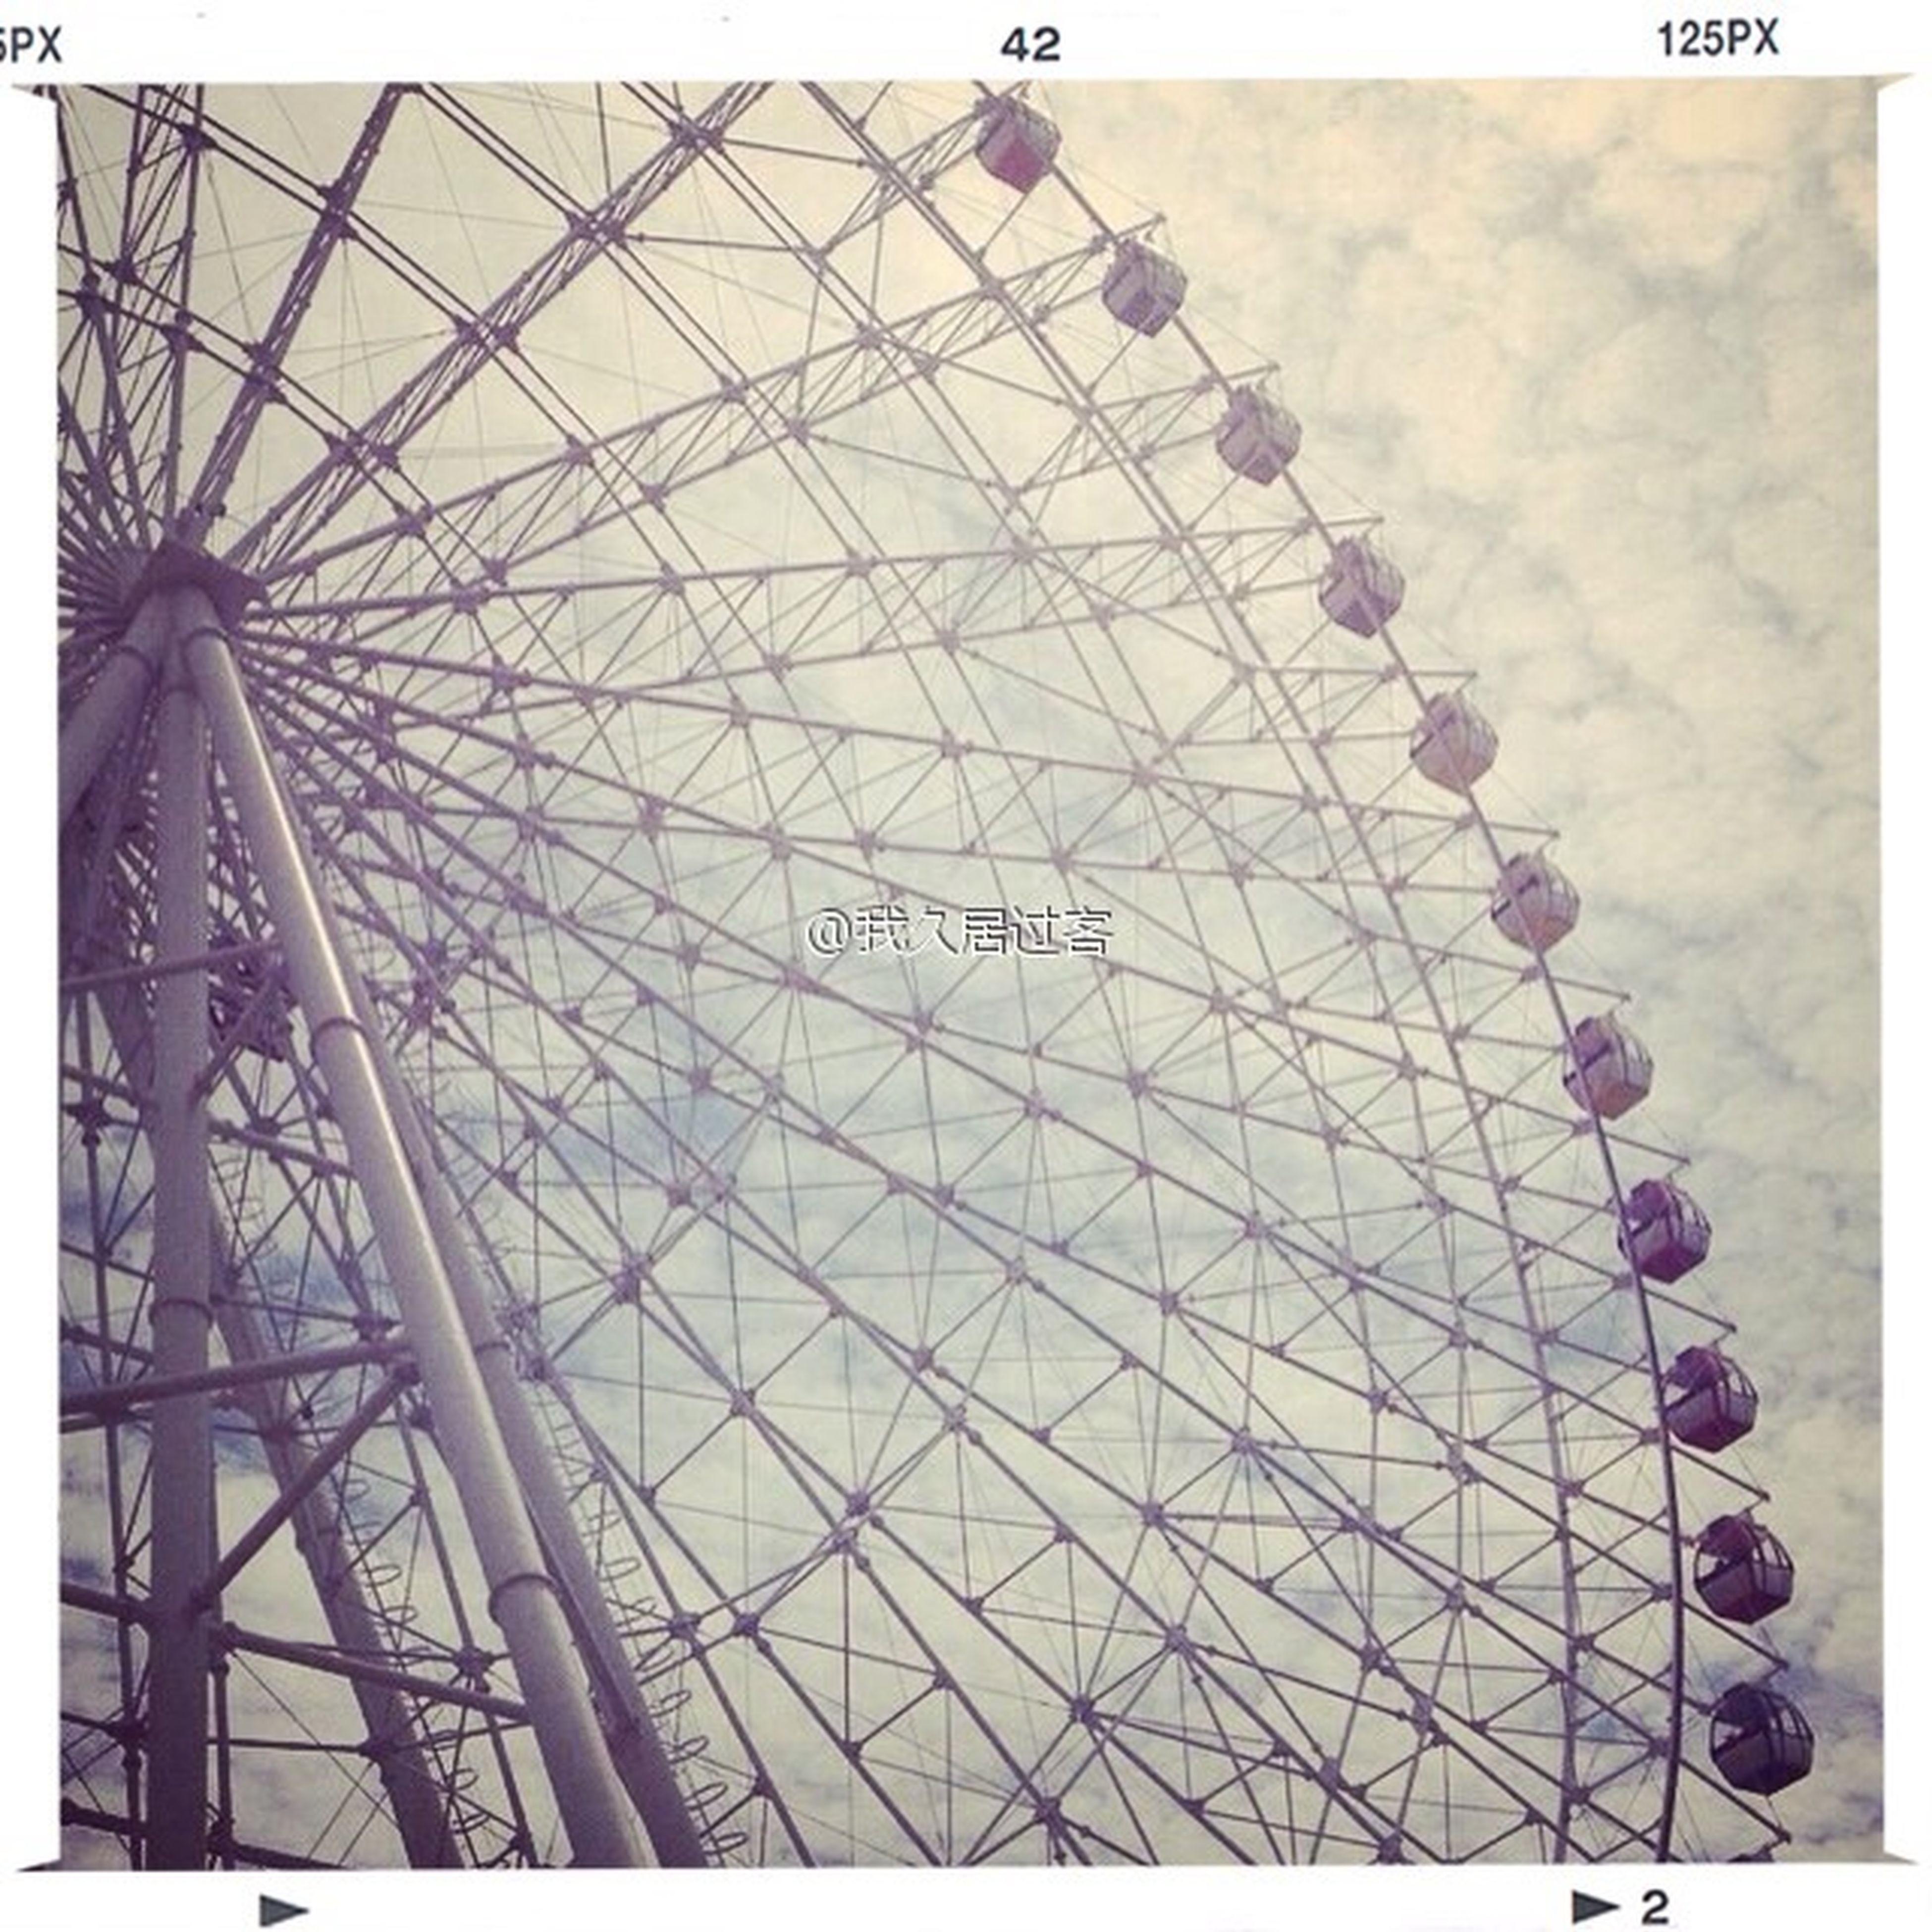 low angle view, transfer print, built structure, amusement park, ferris wheel, amusement park ride, architecture, metal, pattern, auto post production filter, design, arts culture and entertainment, day, sky, metallic, famous place, geometric shape, indoors, capital cities